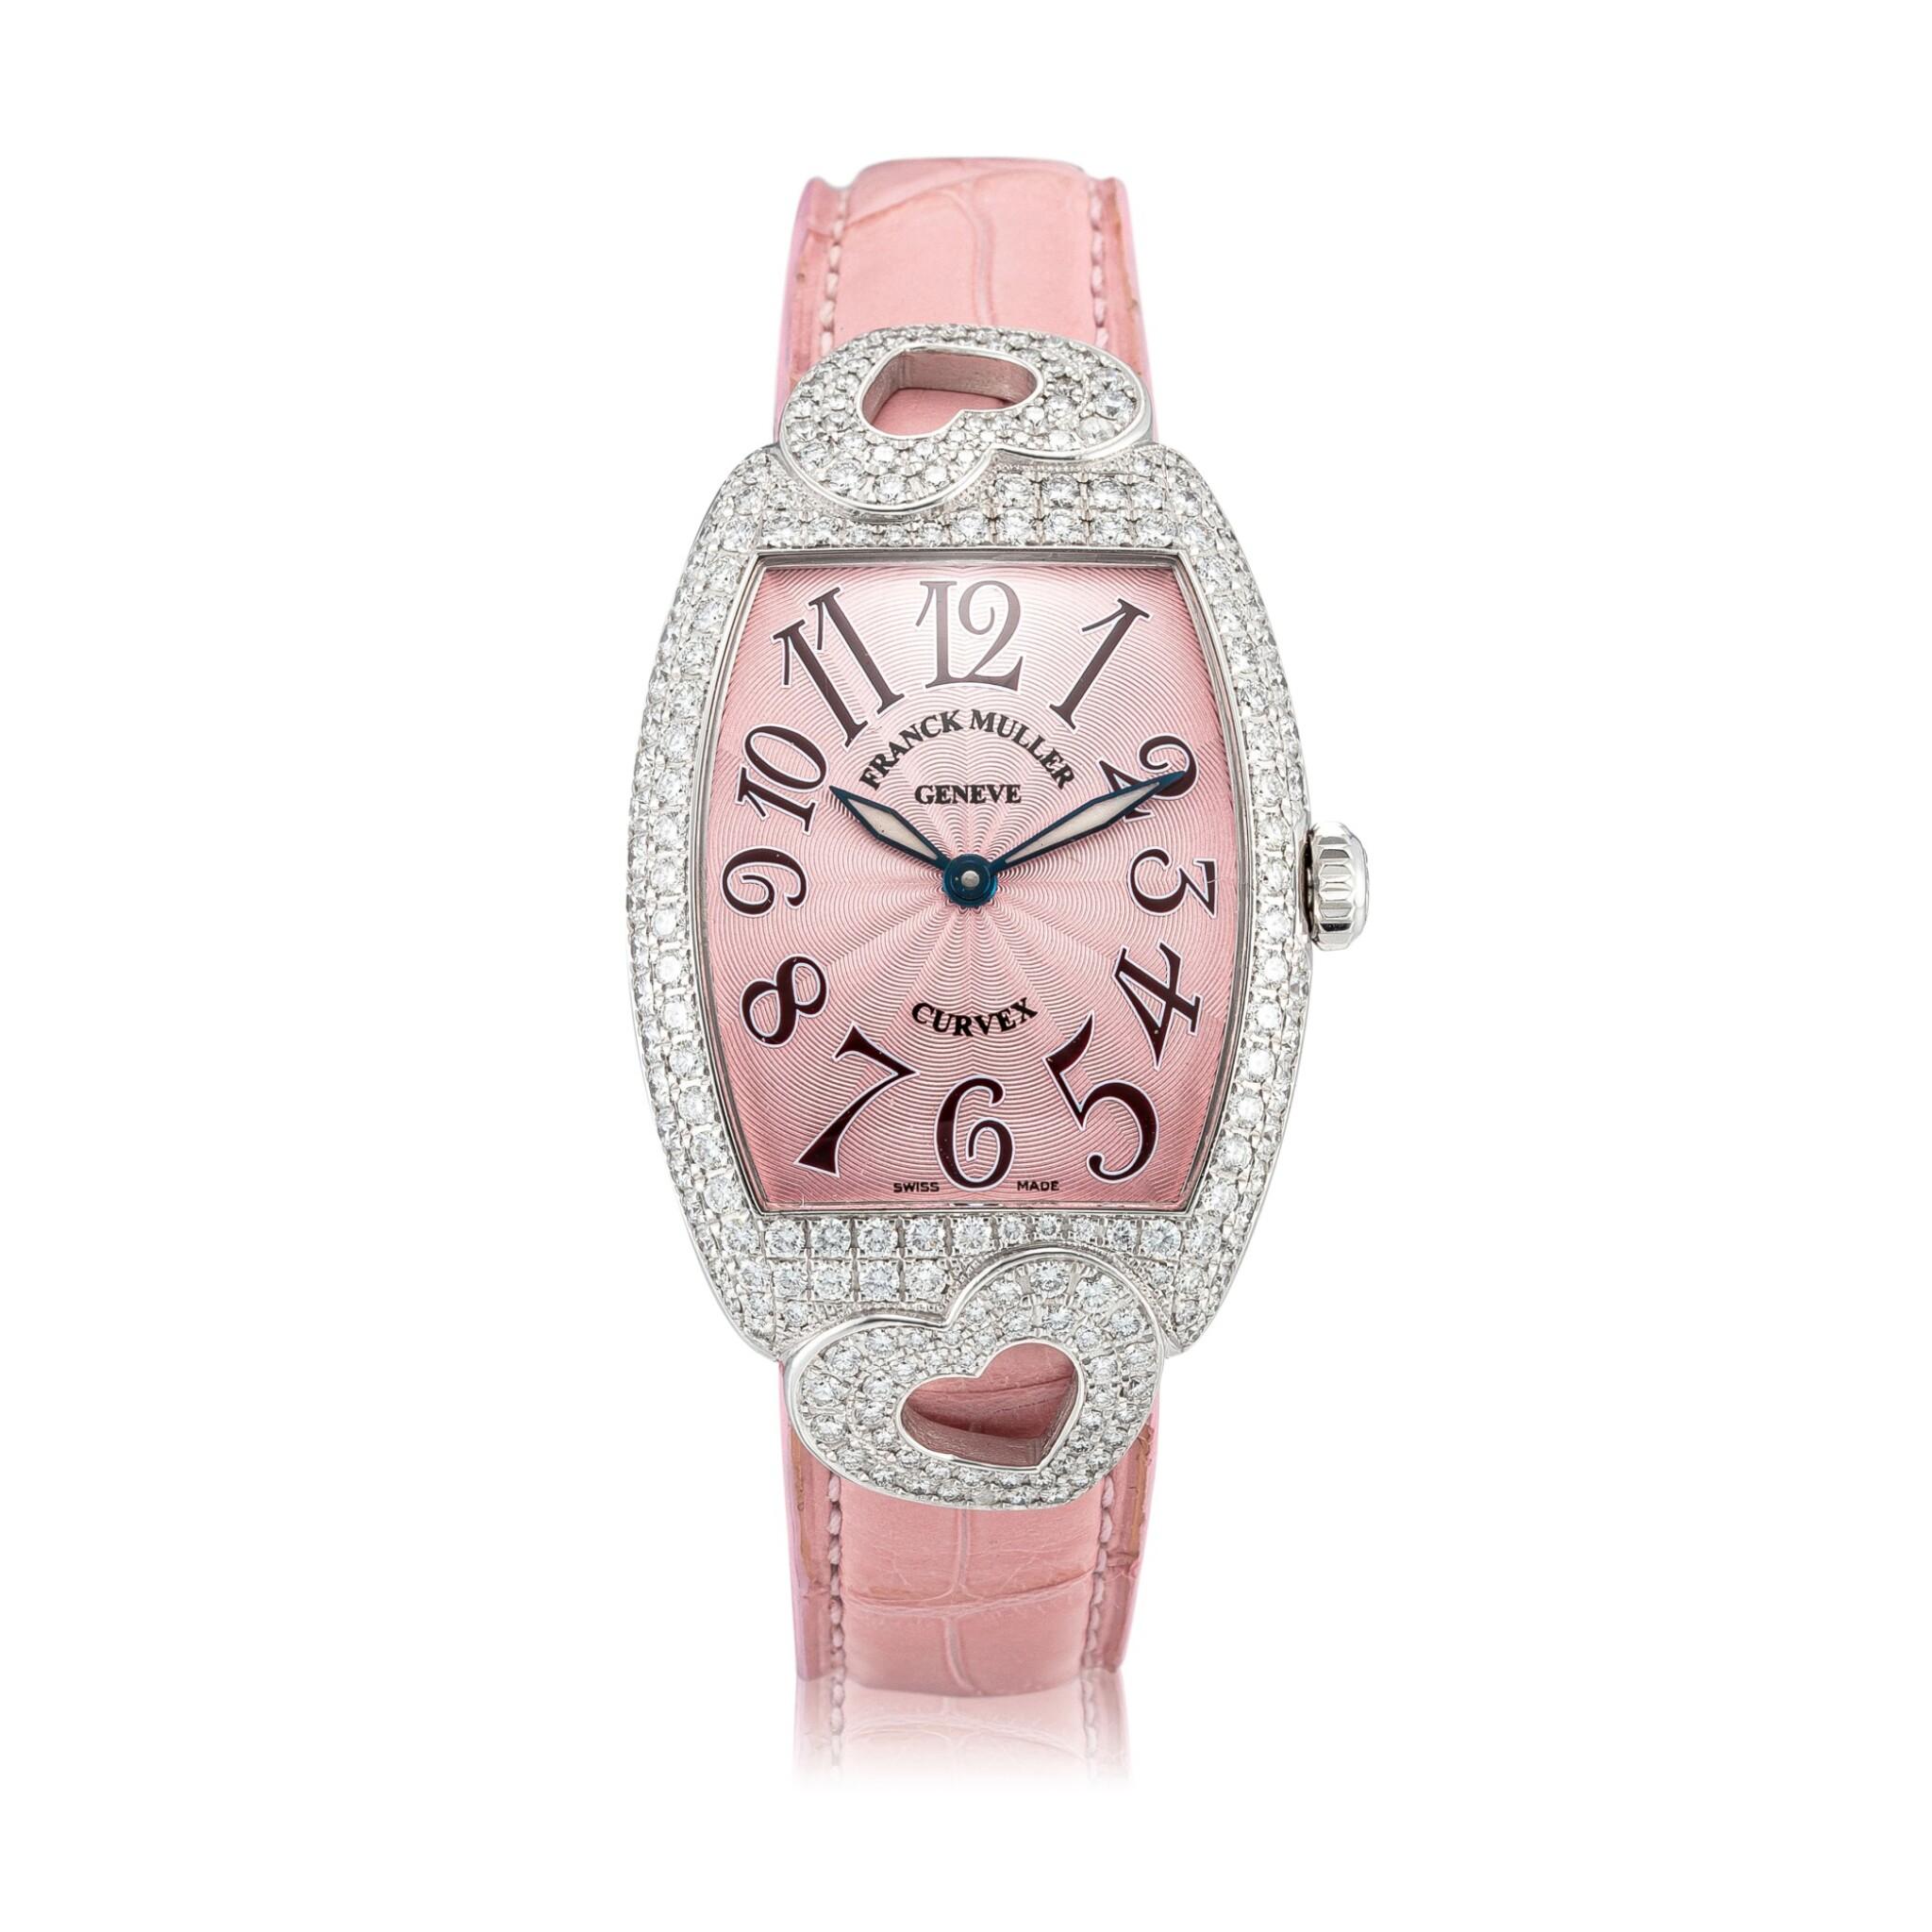 View 1 of Lot 8057. Franck Muller   Curvex, Reference 7502 QZ HJ, A white gold and diamond-set wristwatch, Circa 2000   Curvex 型號7502 QZ HJ  白金鑲鑽石腕錶,約2000年製.